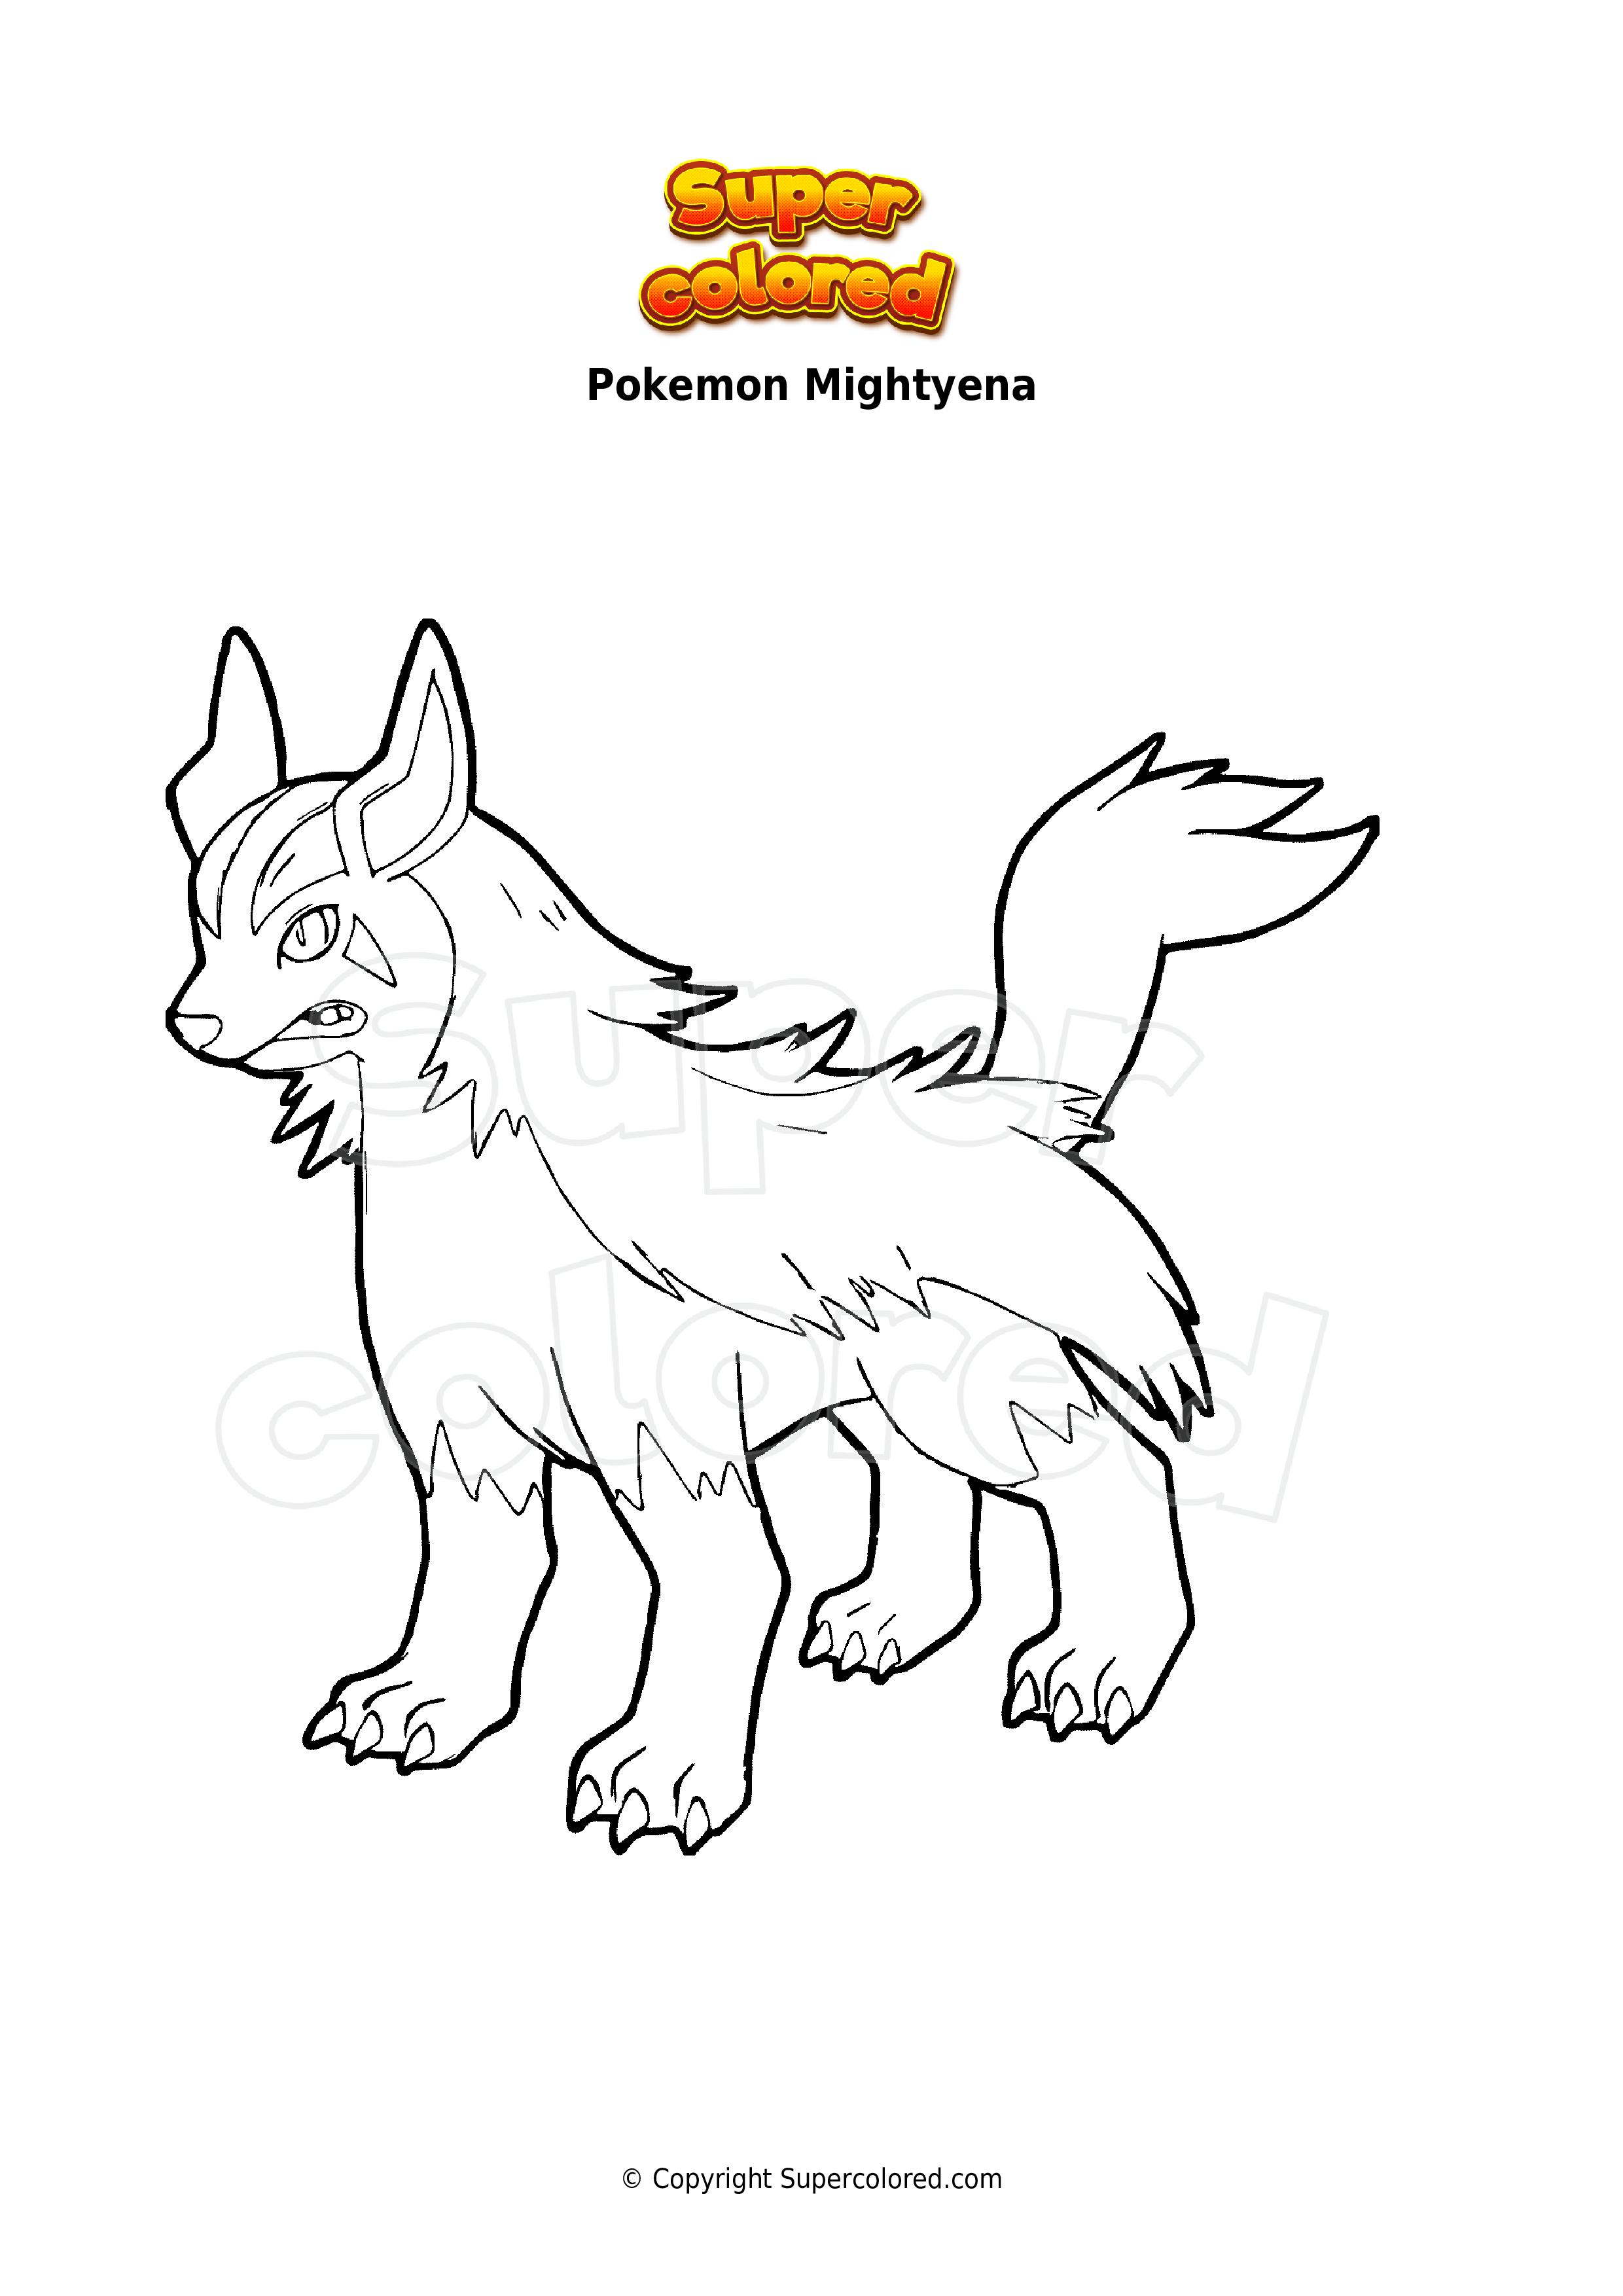 Coloring Page Pokemon Mightyena Supercolored Com